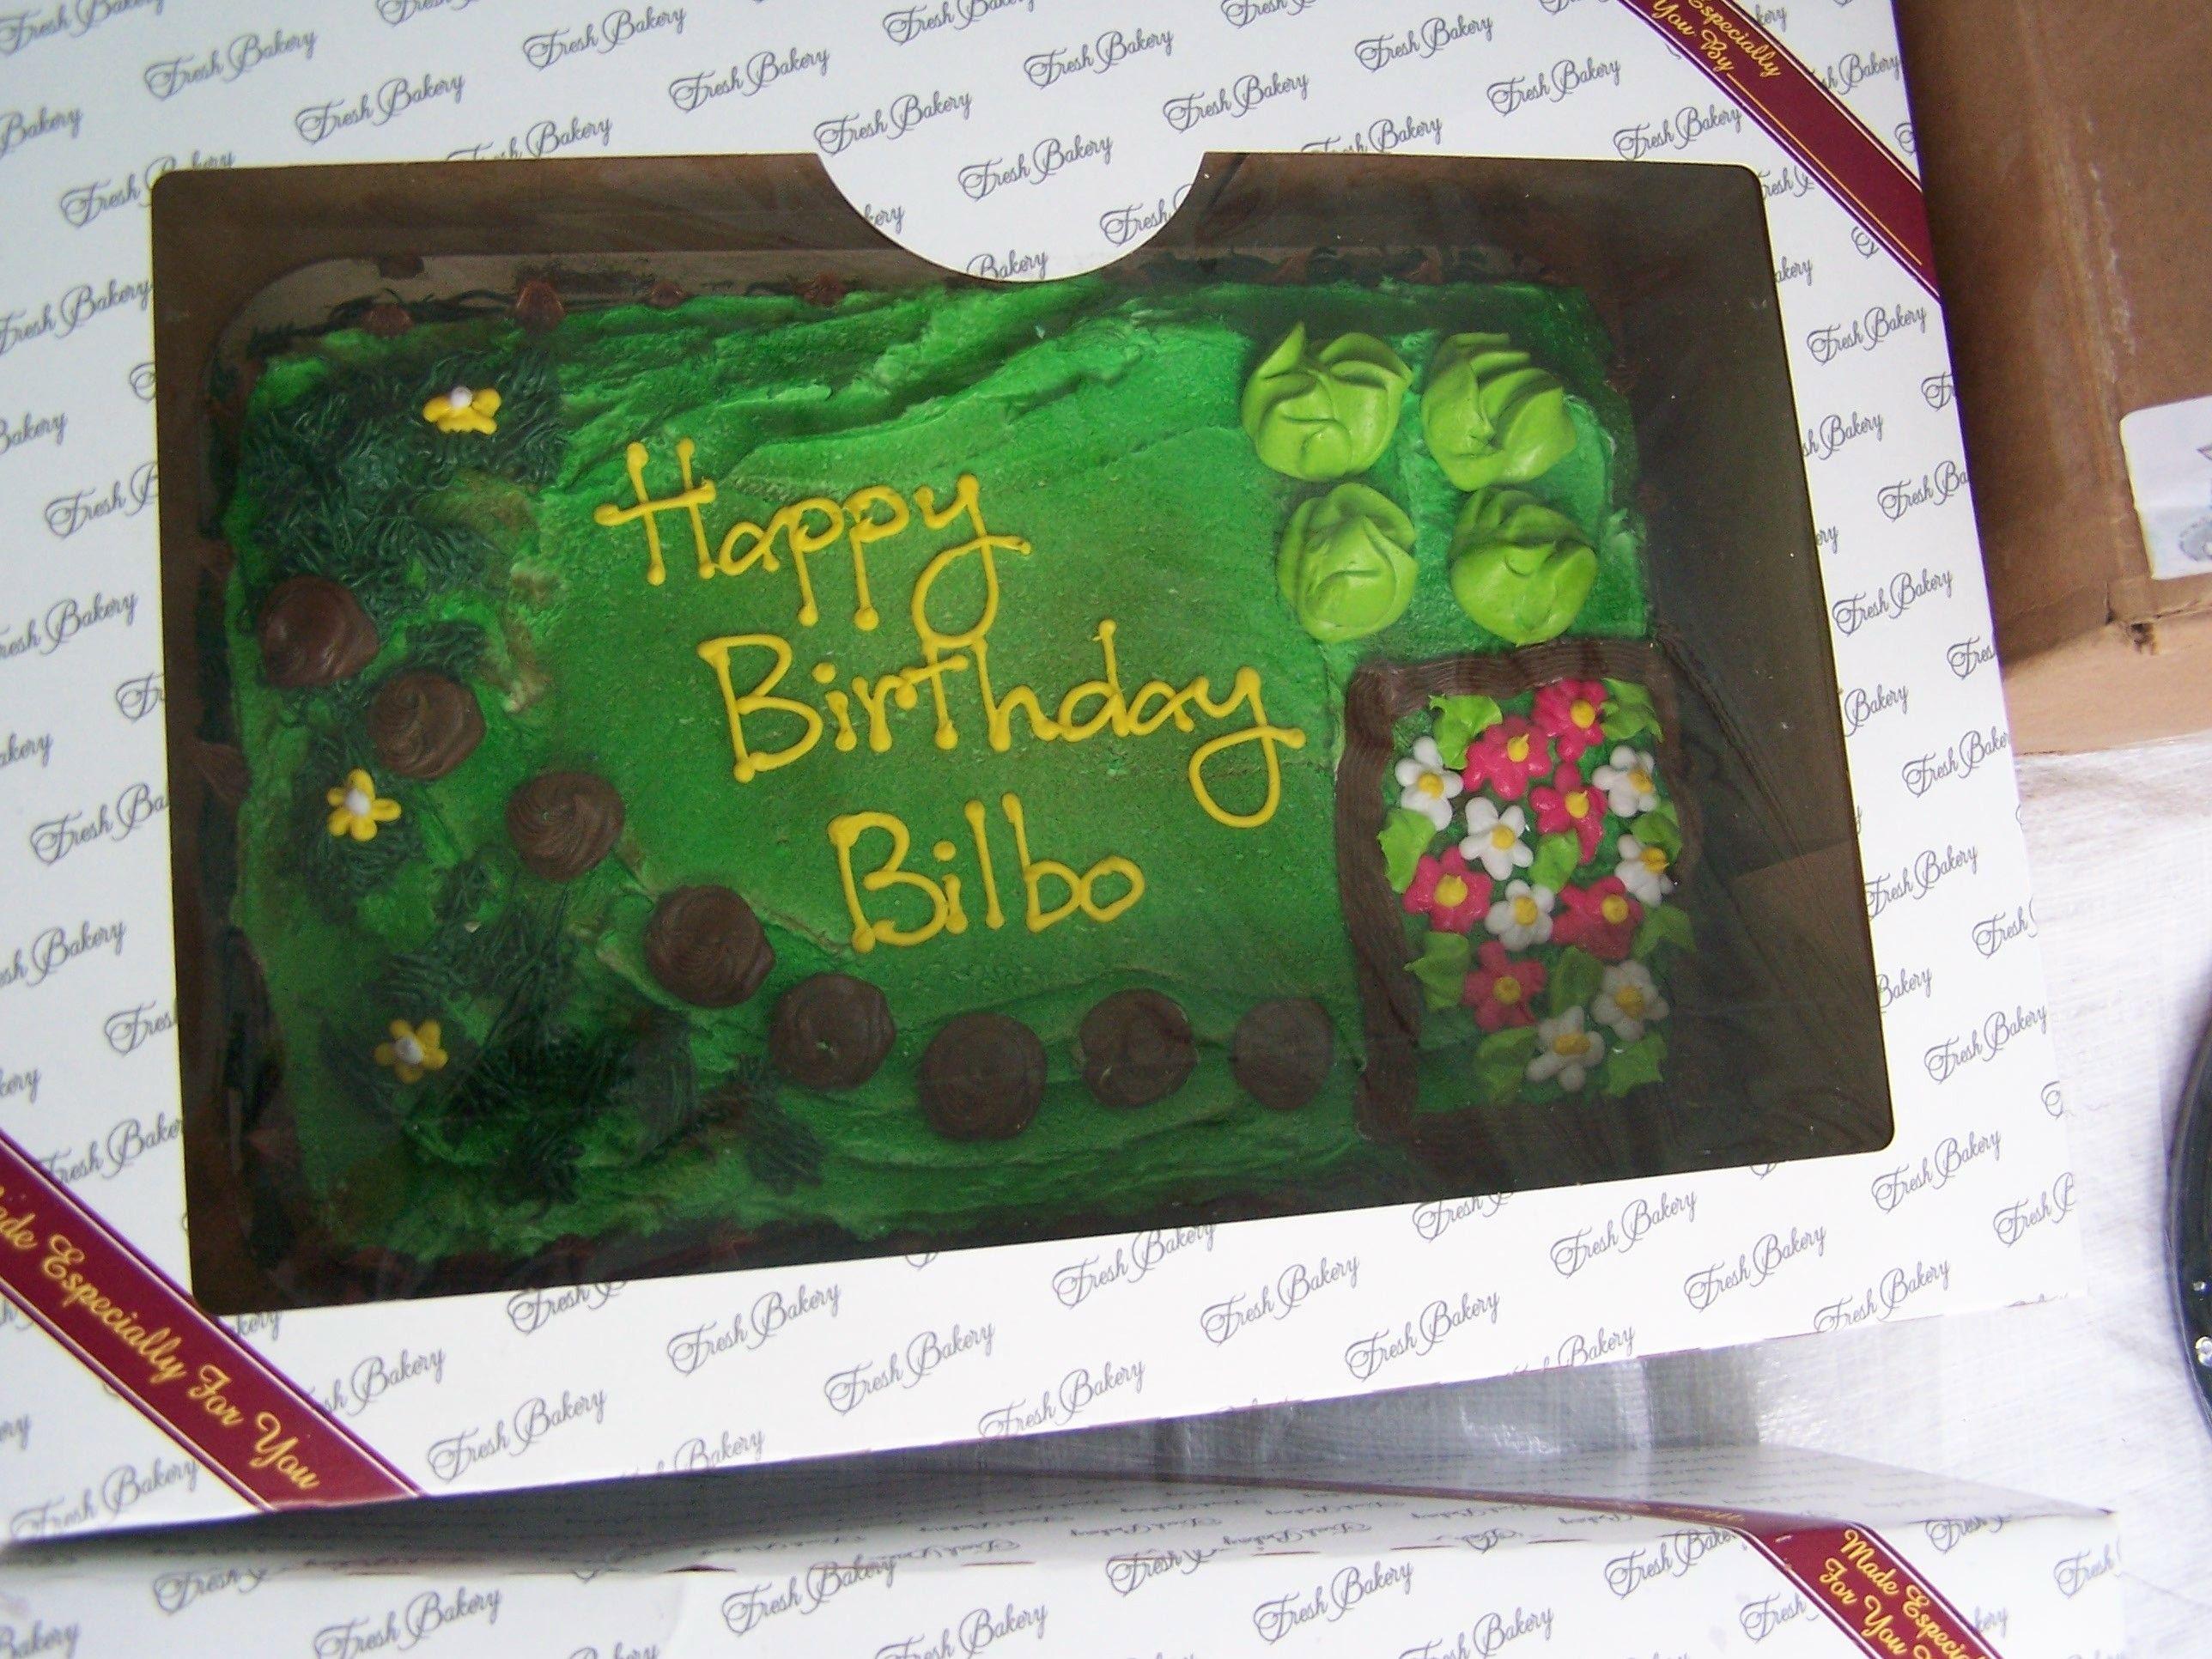 Bilbo Bagginss Birthday Cake Lordoftherings Bilbobaggins Funny